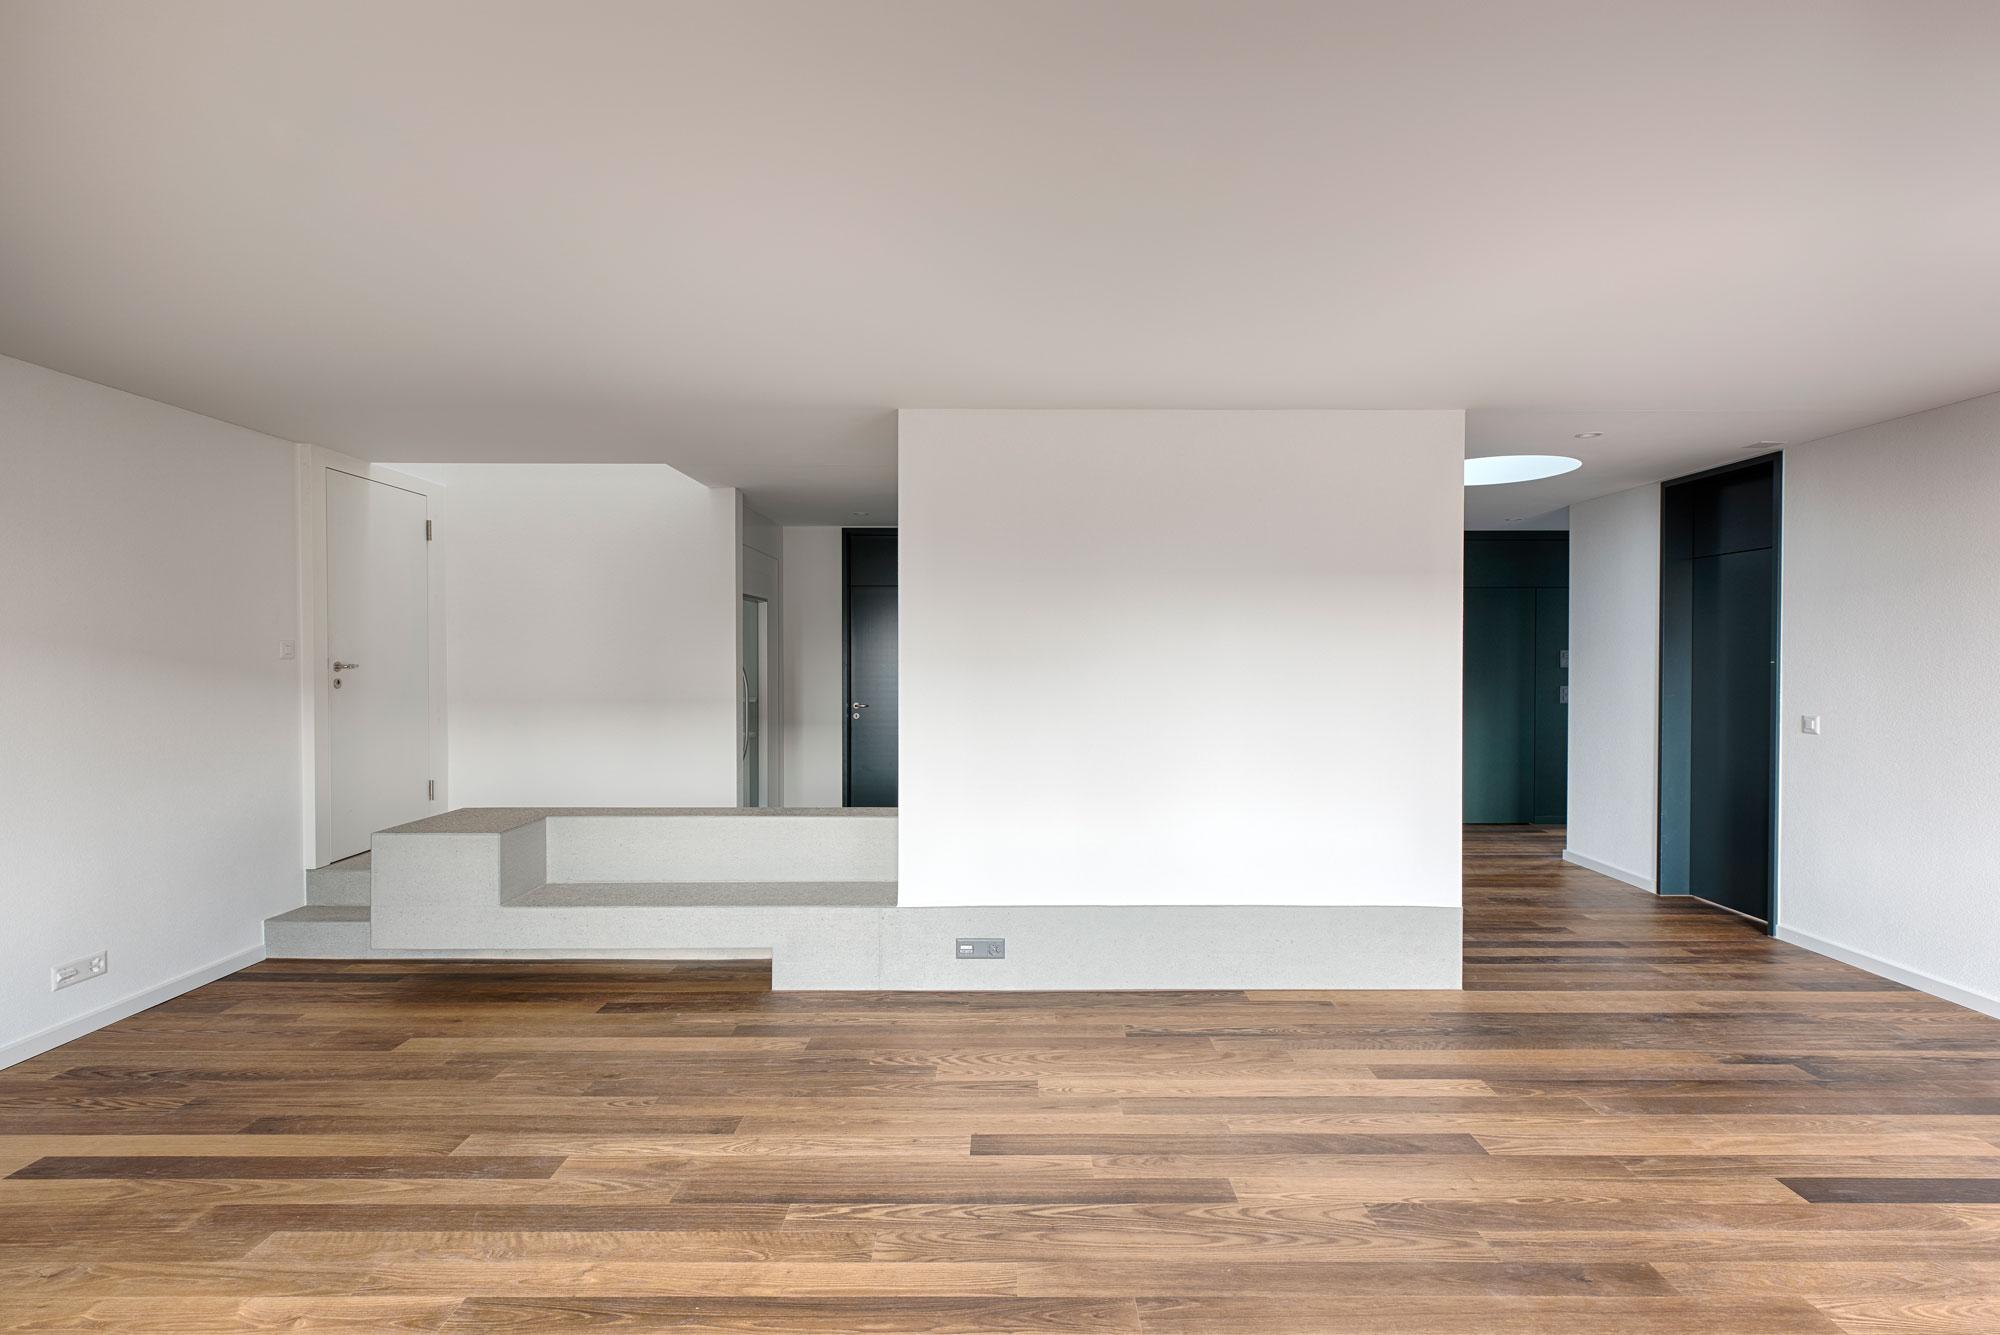 MAA_Murer_Andre_Umbau_Wohnung_Haus_K_Buttisholz_012.jpg